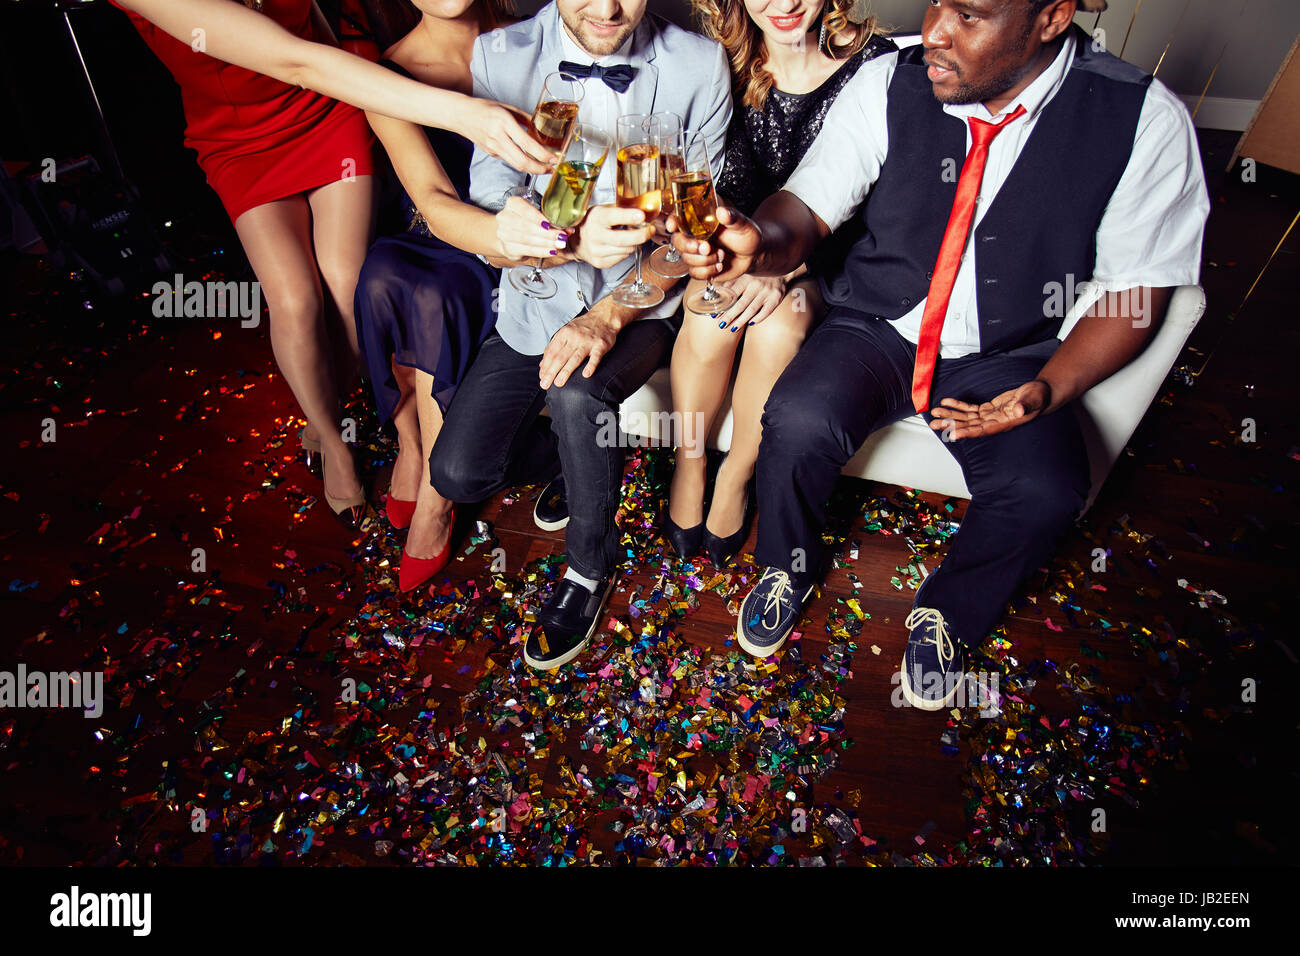 Celebrating Momentous Event at Night Club Stock Photo